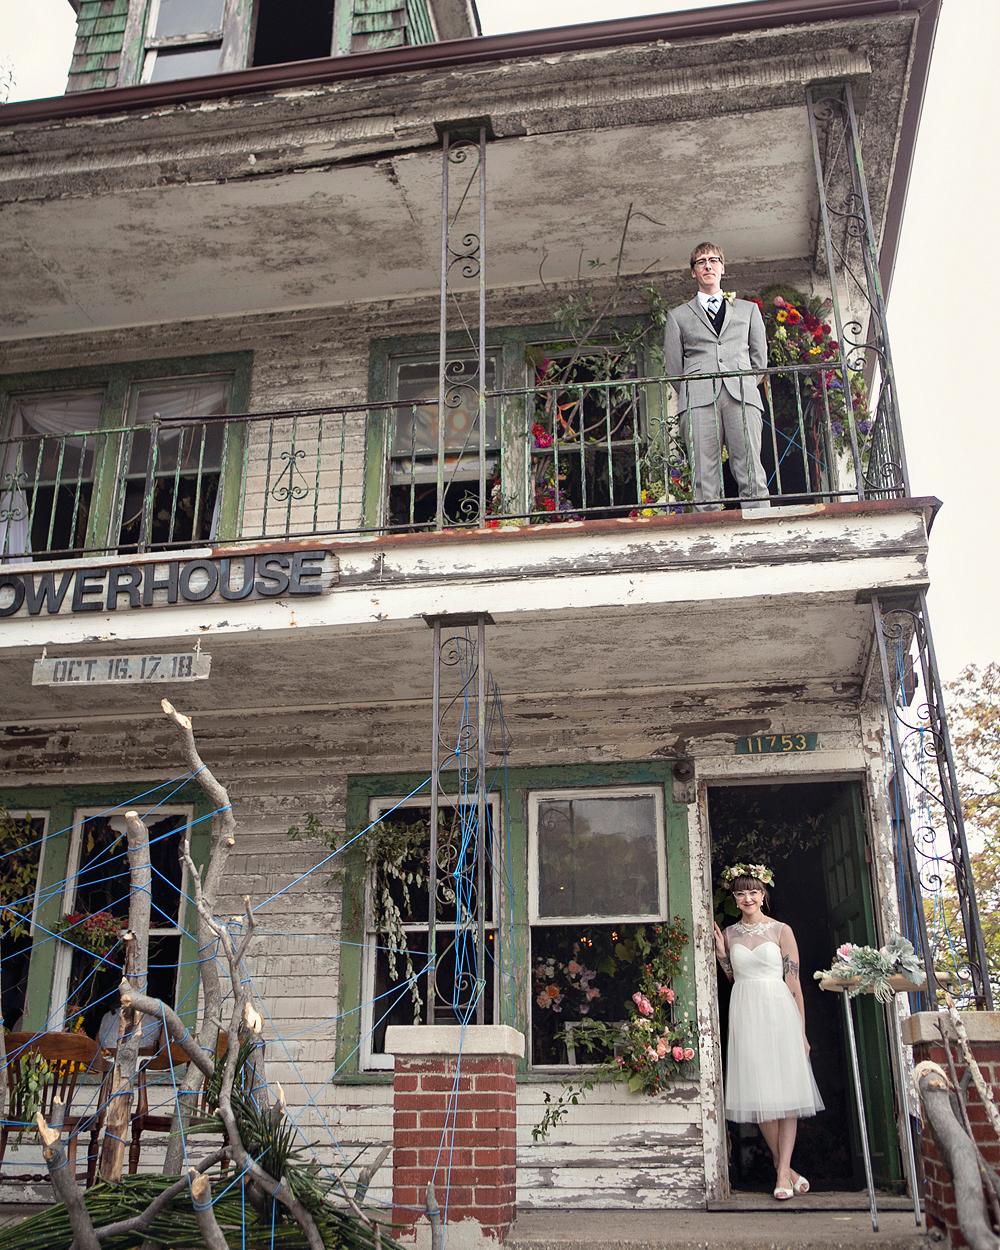 kristen-steve-flowerhouse-wedding-couple-6063-s113059-0616.jpg